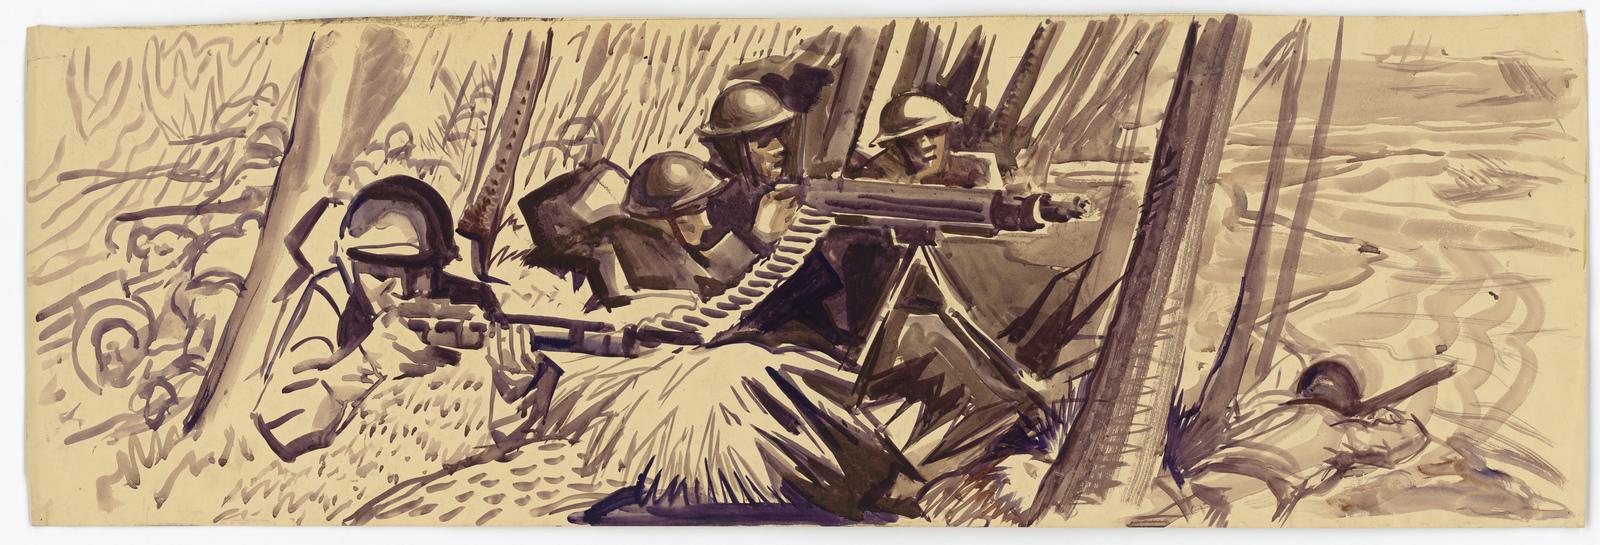 [American machine gun crew fighting off an attack.] (Information on the back: Gonzalez)